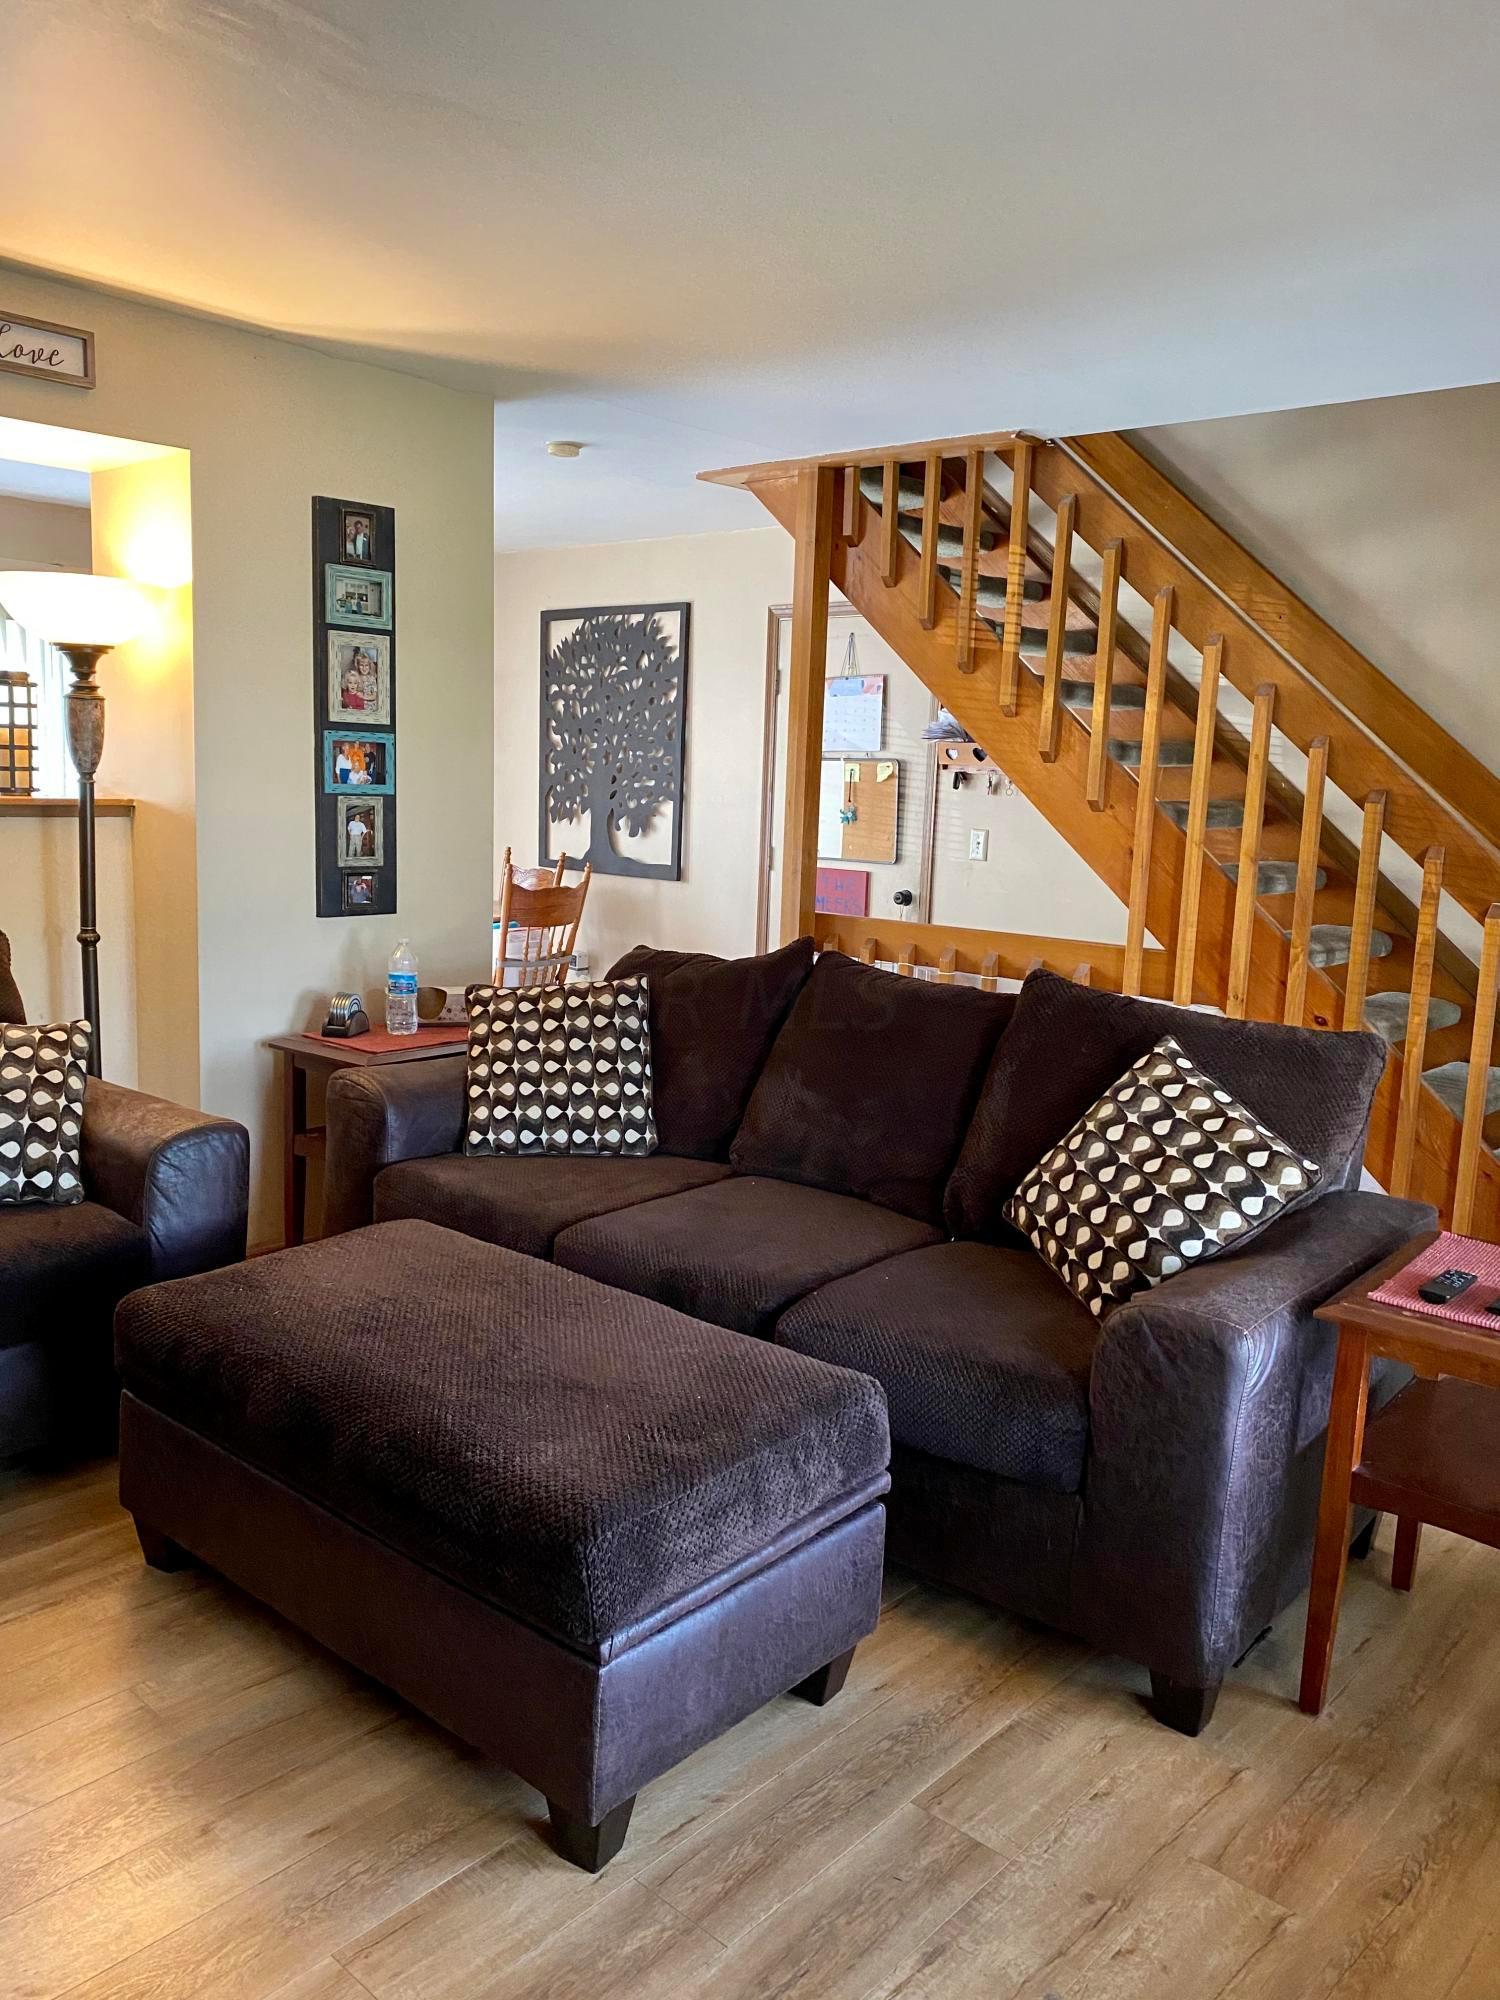 1232 Cedarledge Lane, Galloway, Ohio 43119, 3 Bedrooms Bedrooms, ,1 BathroomBathrooms,Residential,For Sale,Cedarledge,220032307